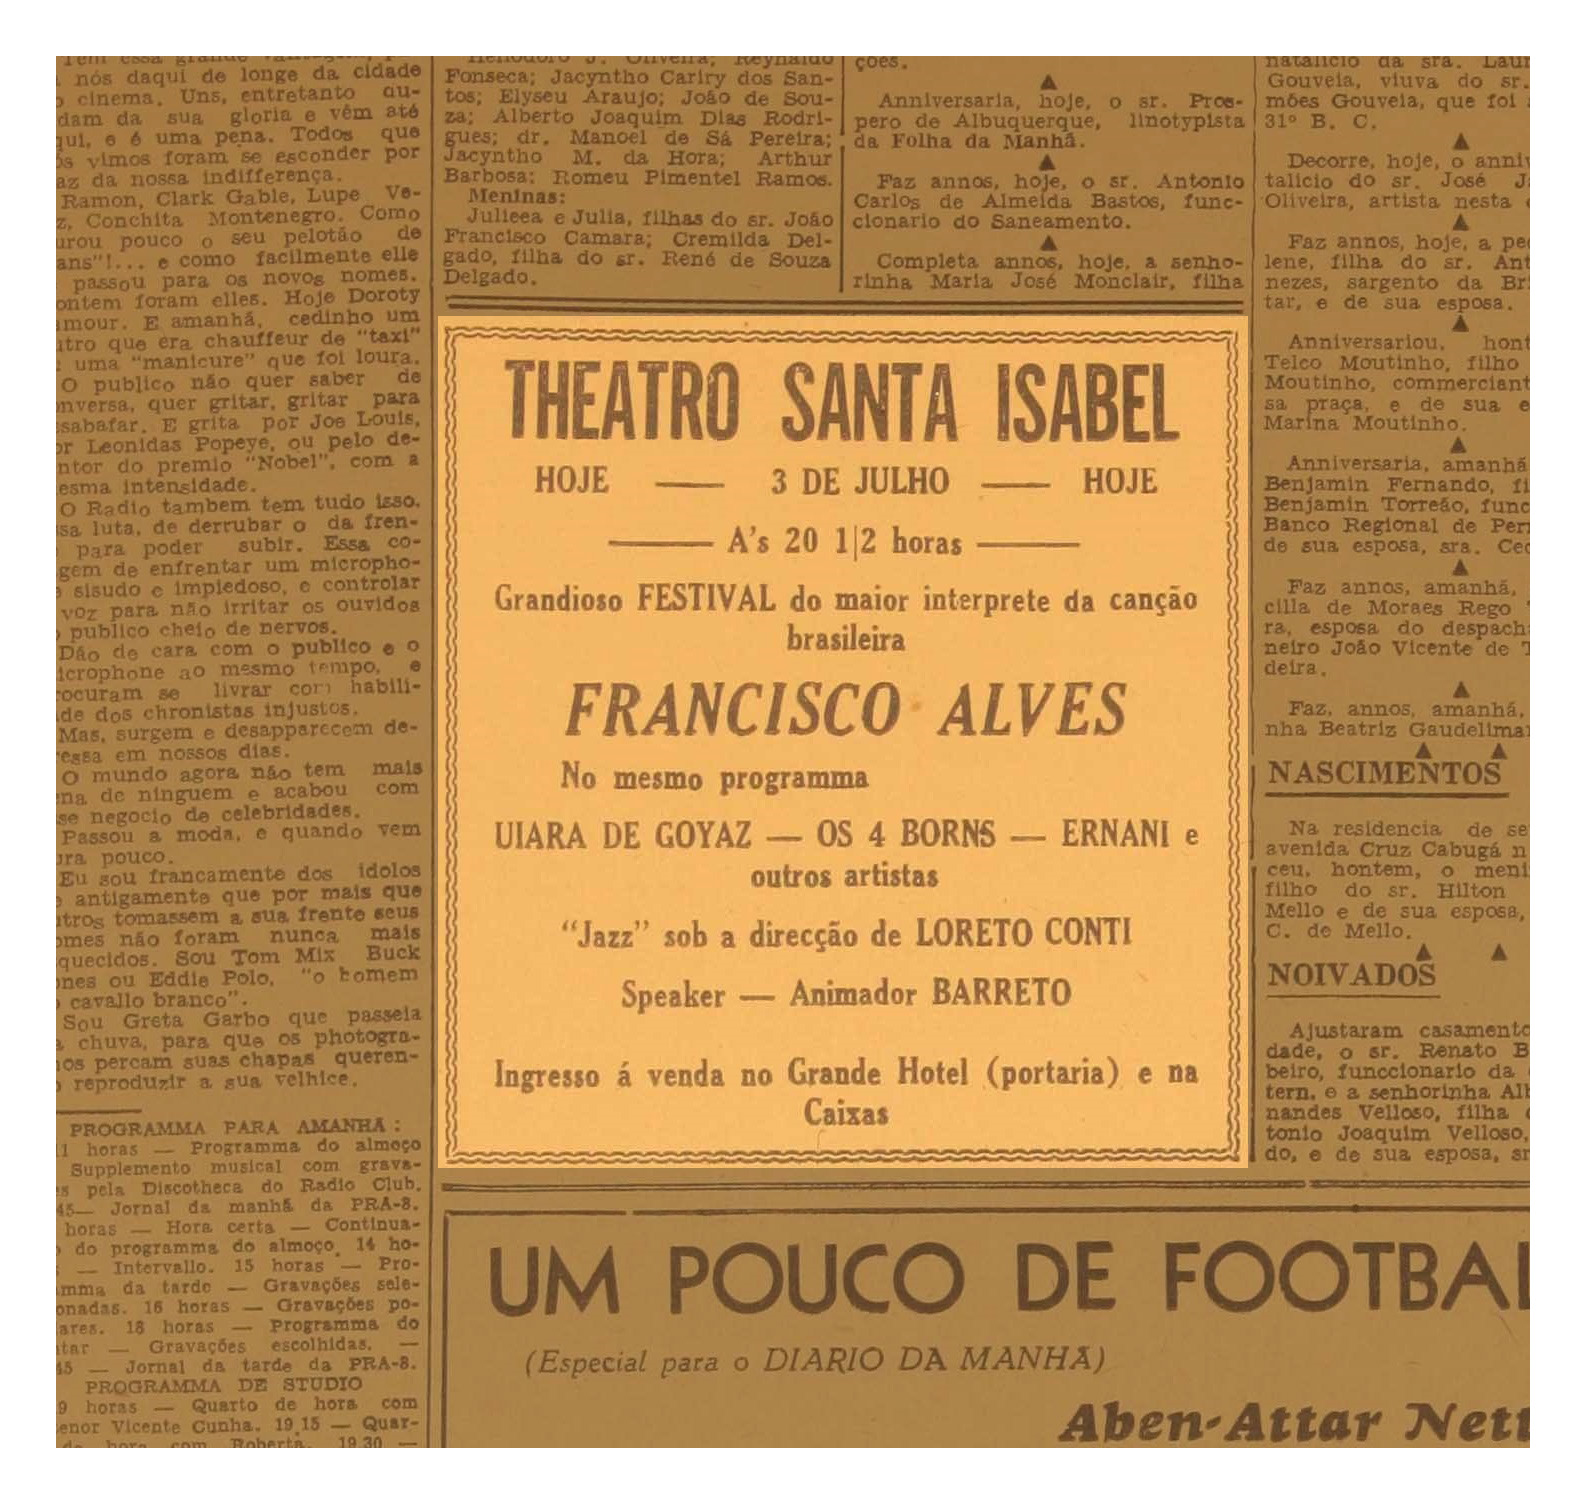 Uyara-1938-07-03_DiárioDaManhã_Recife-PE-2-copy.jpg